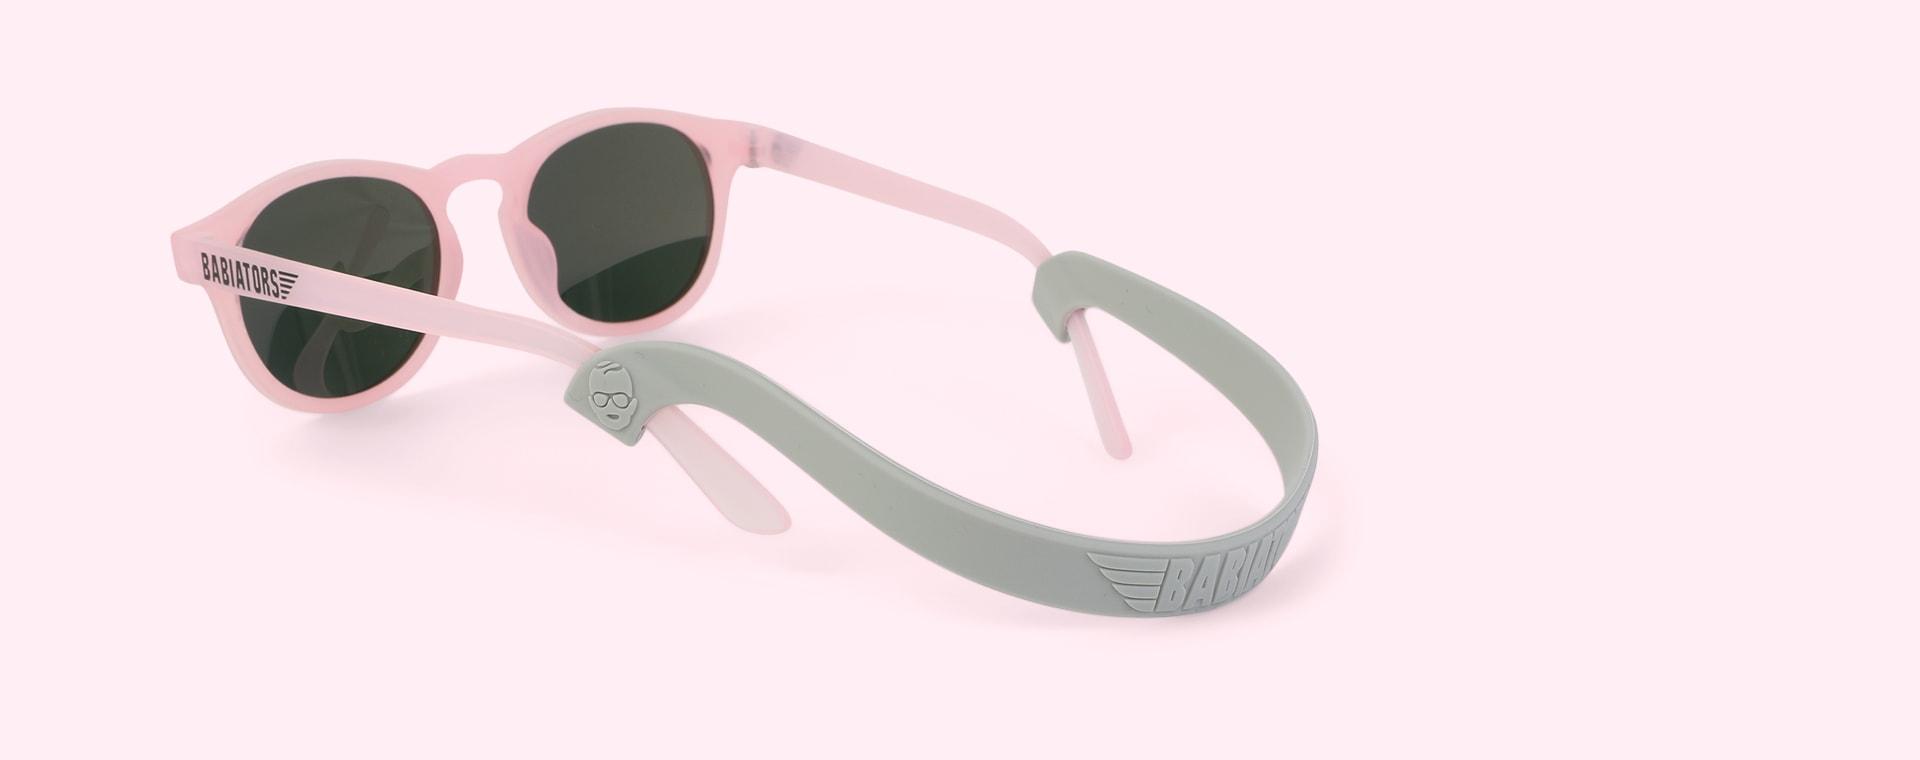 The Pixie Babiators Blue Series Keyhole sunglasses